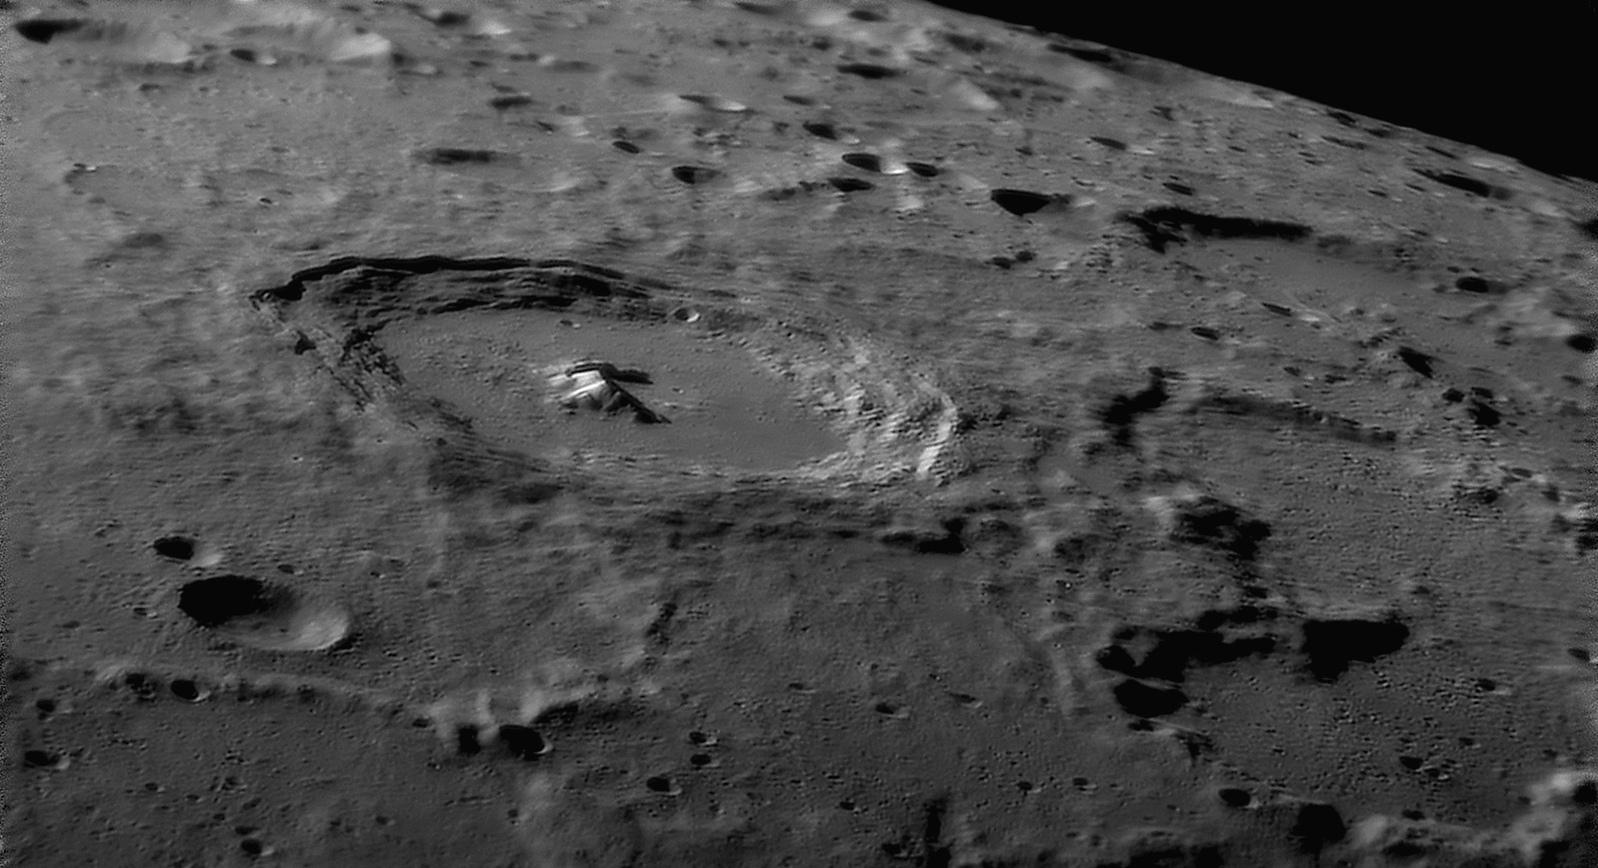 Lune 25/08/2019 C14 ASI290 Barlow 2x Clavé : PYTHAGOR